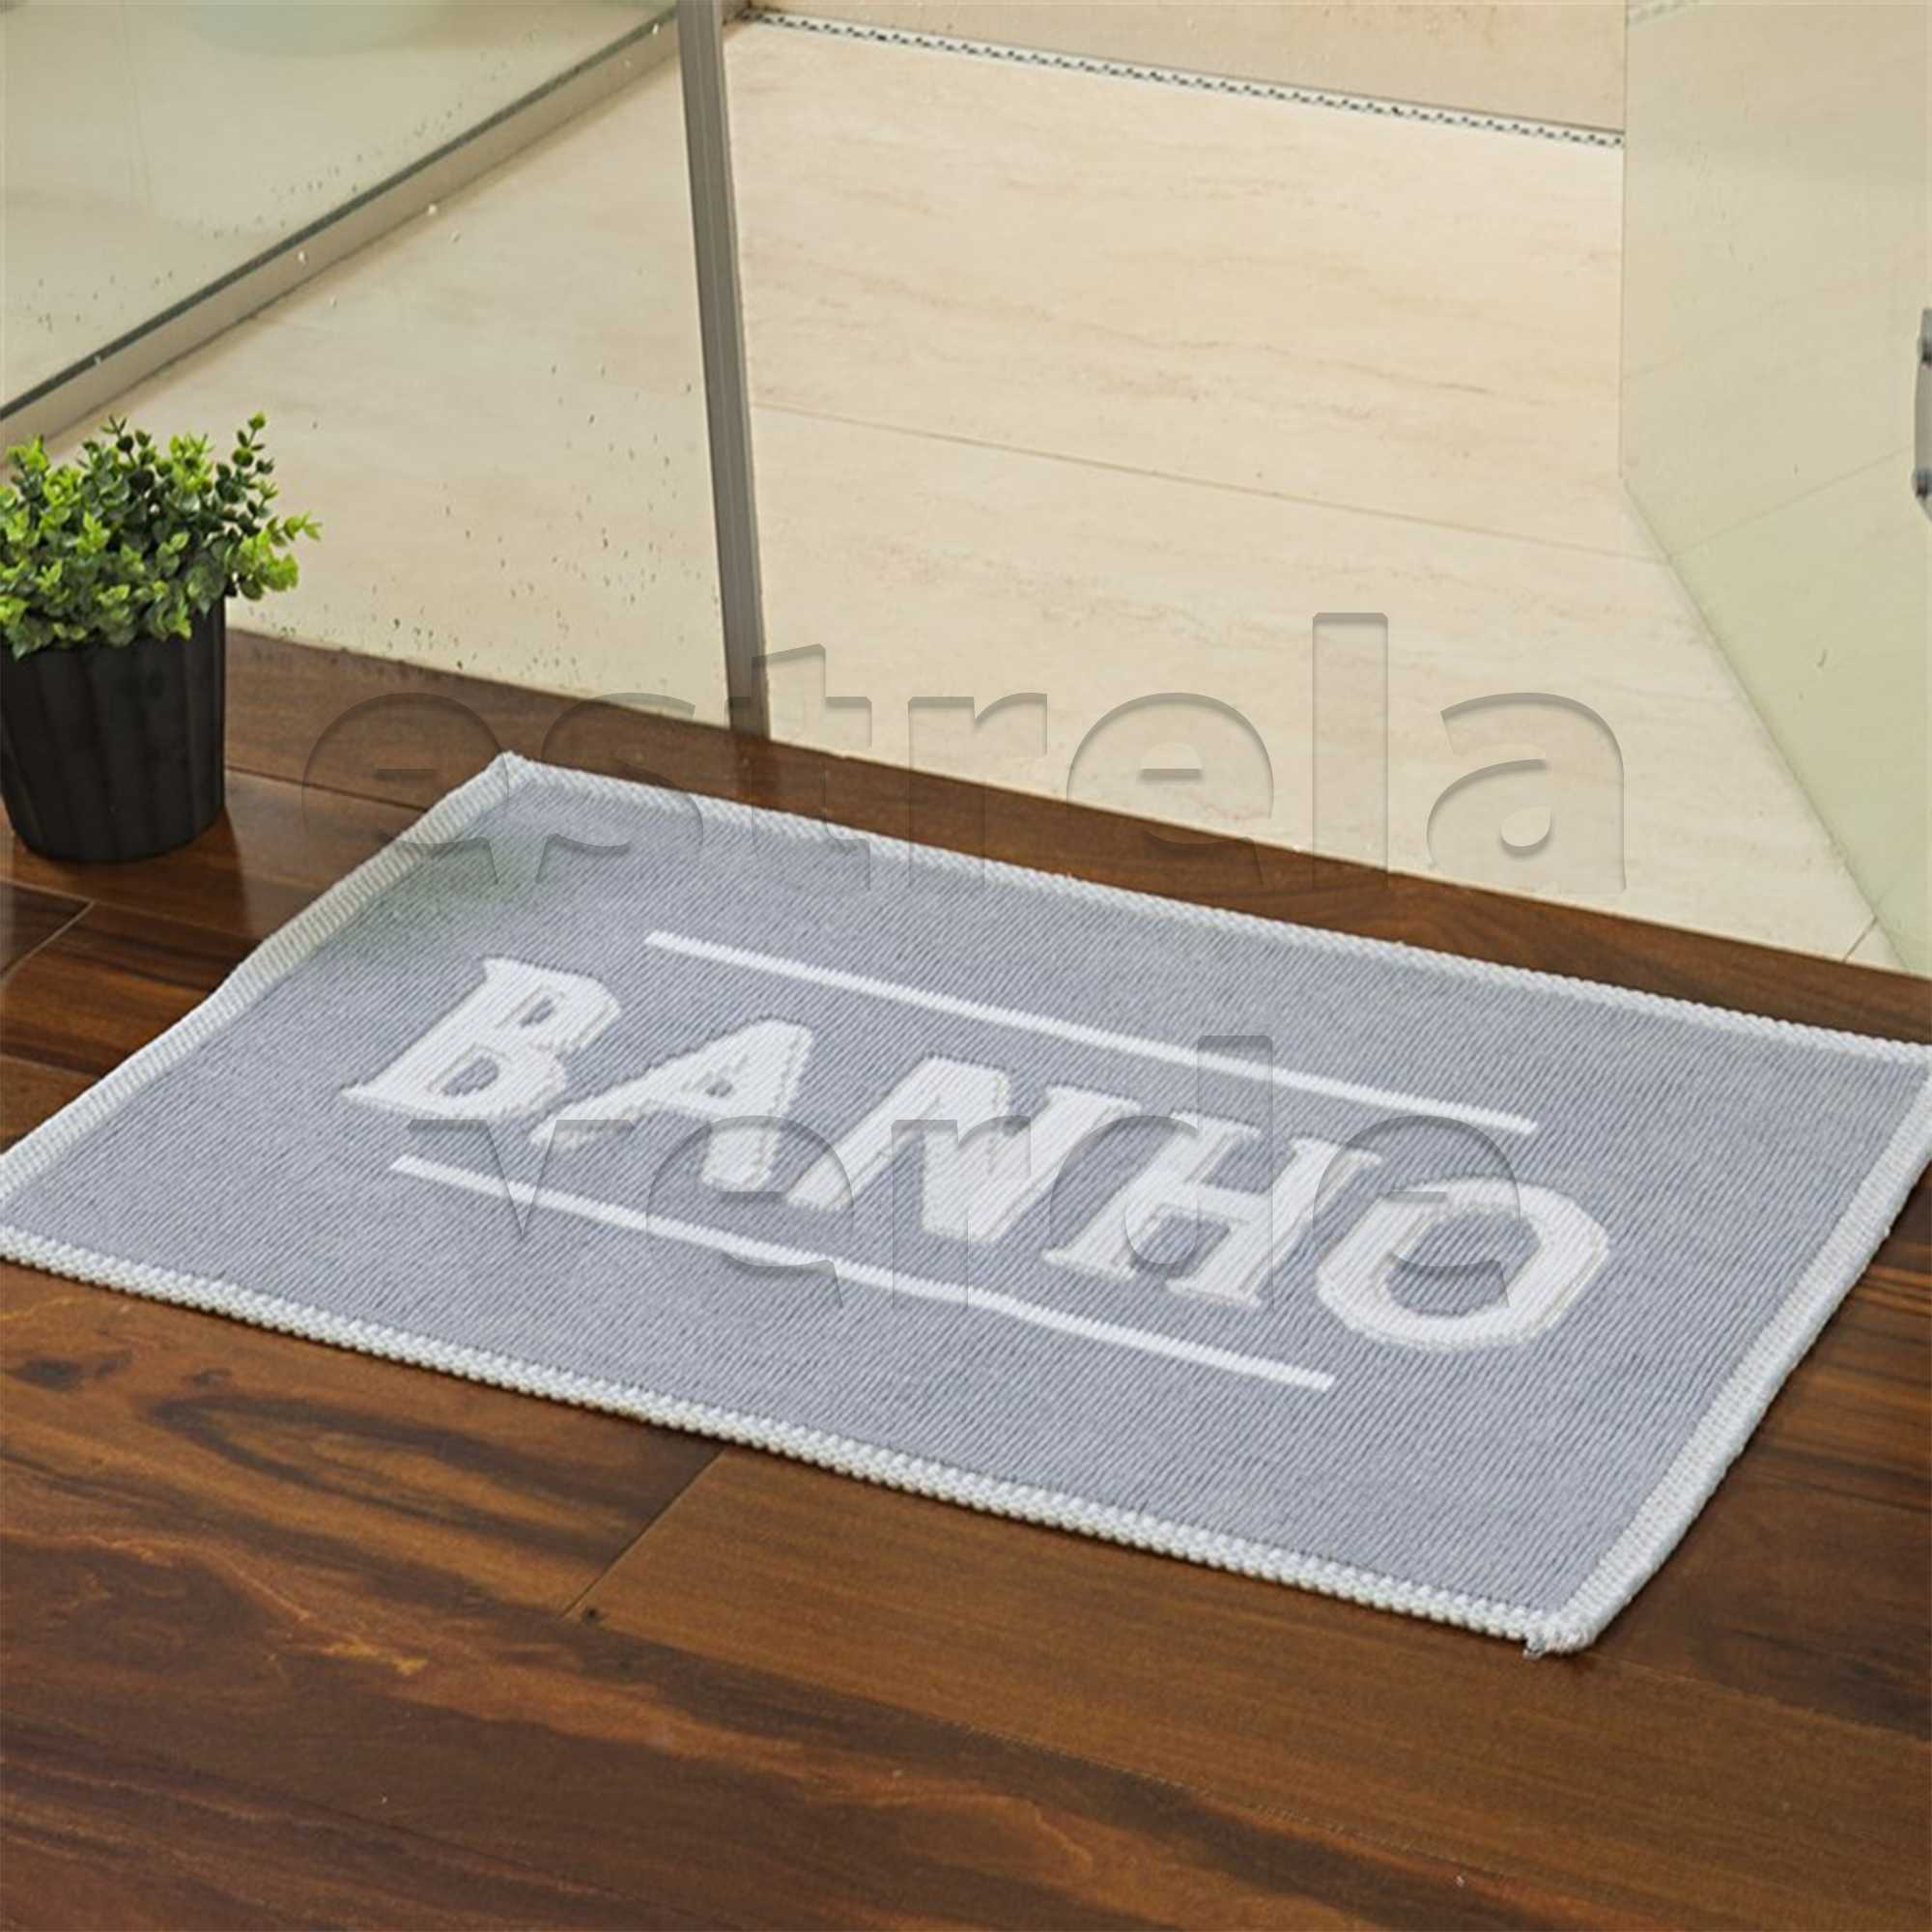 TAPETE BANHO 0,50 X 0,80 AZUL ROYAL  - Estrela Verde